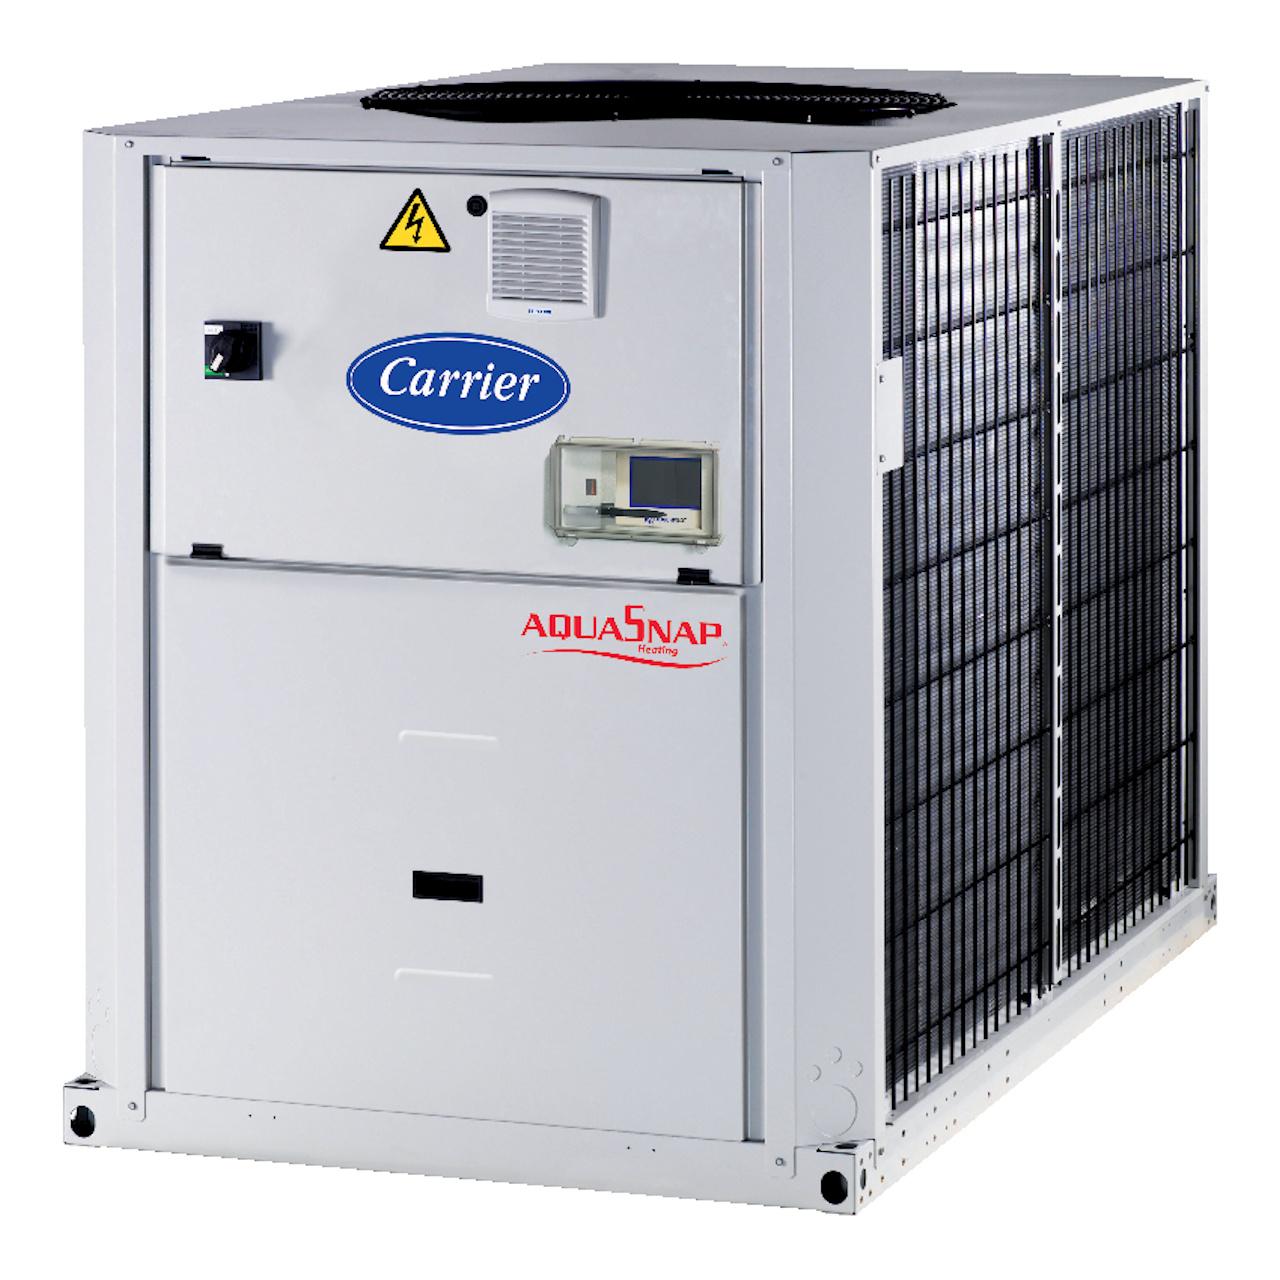 carrier-61AF-022-105-air-to-water-heat-pump